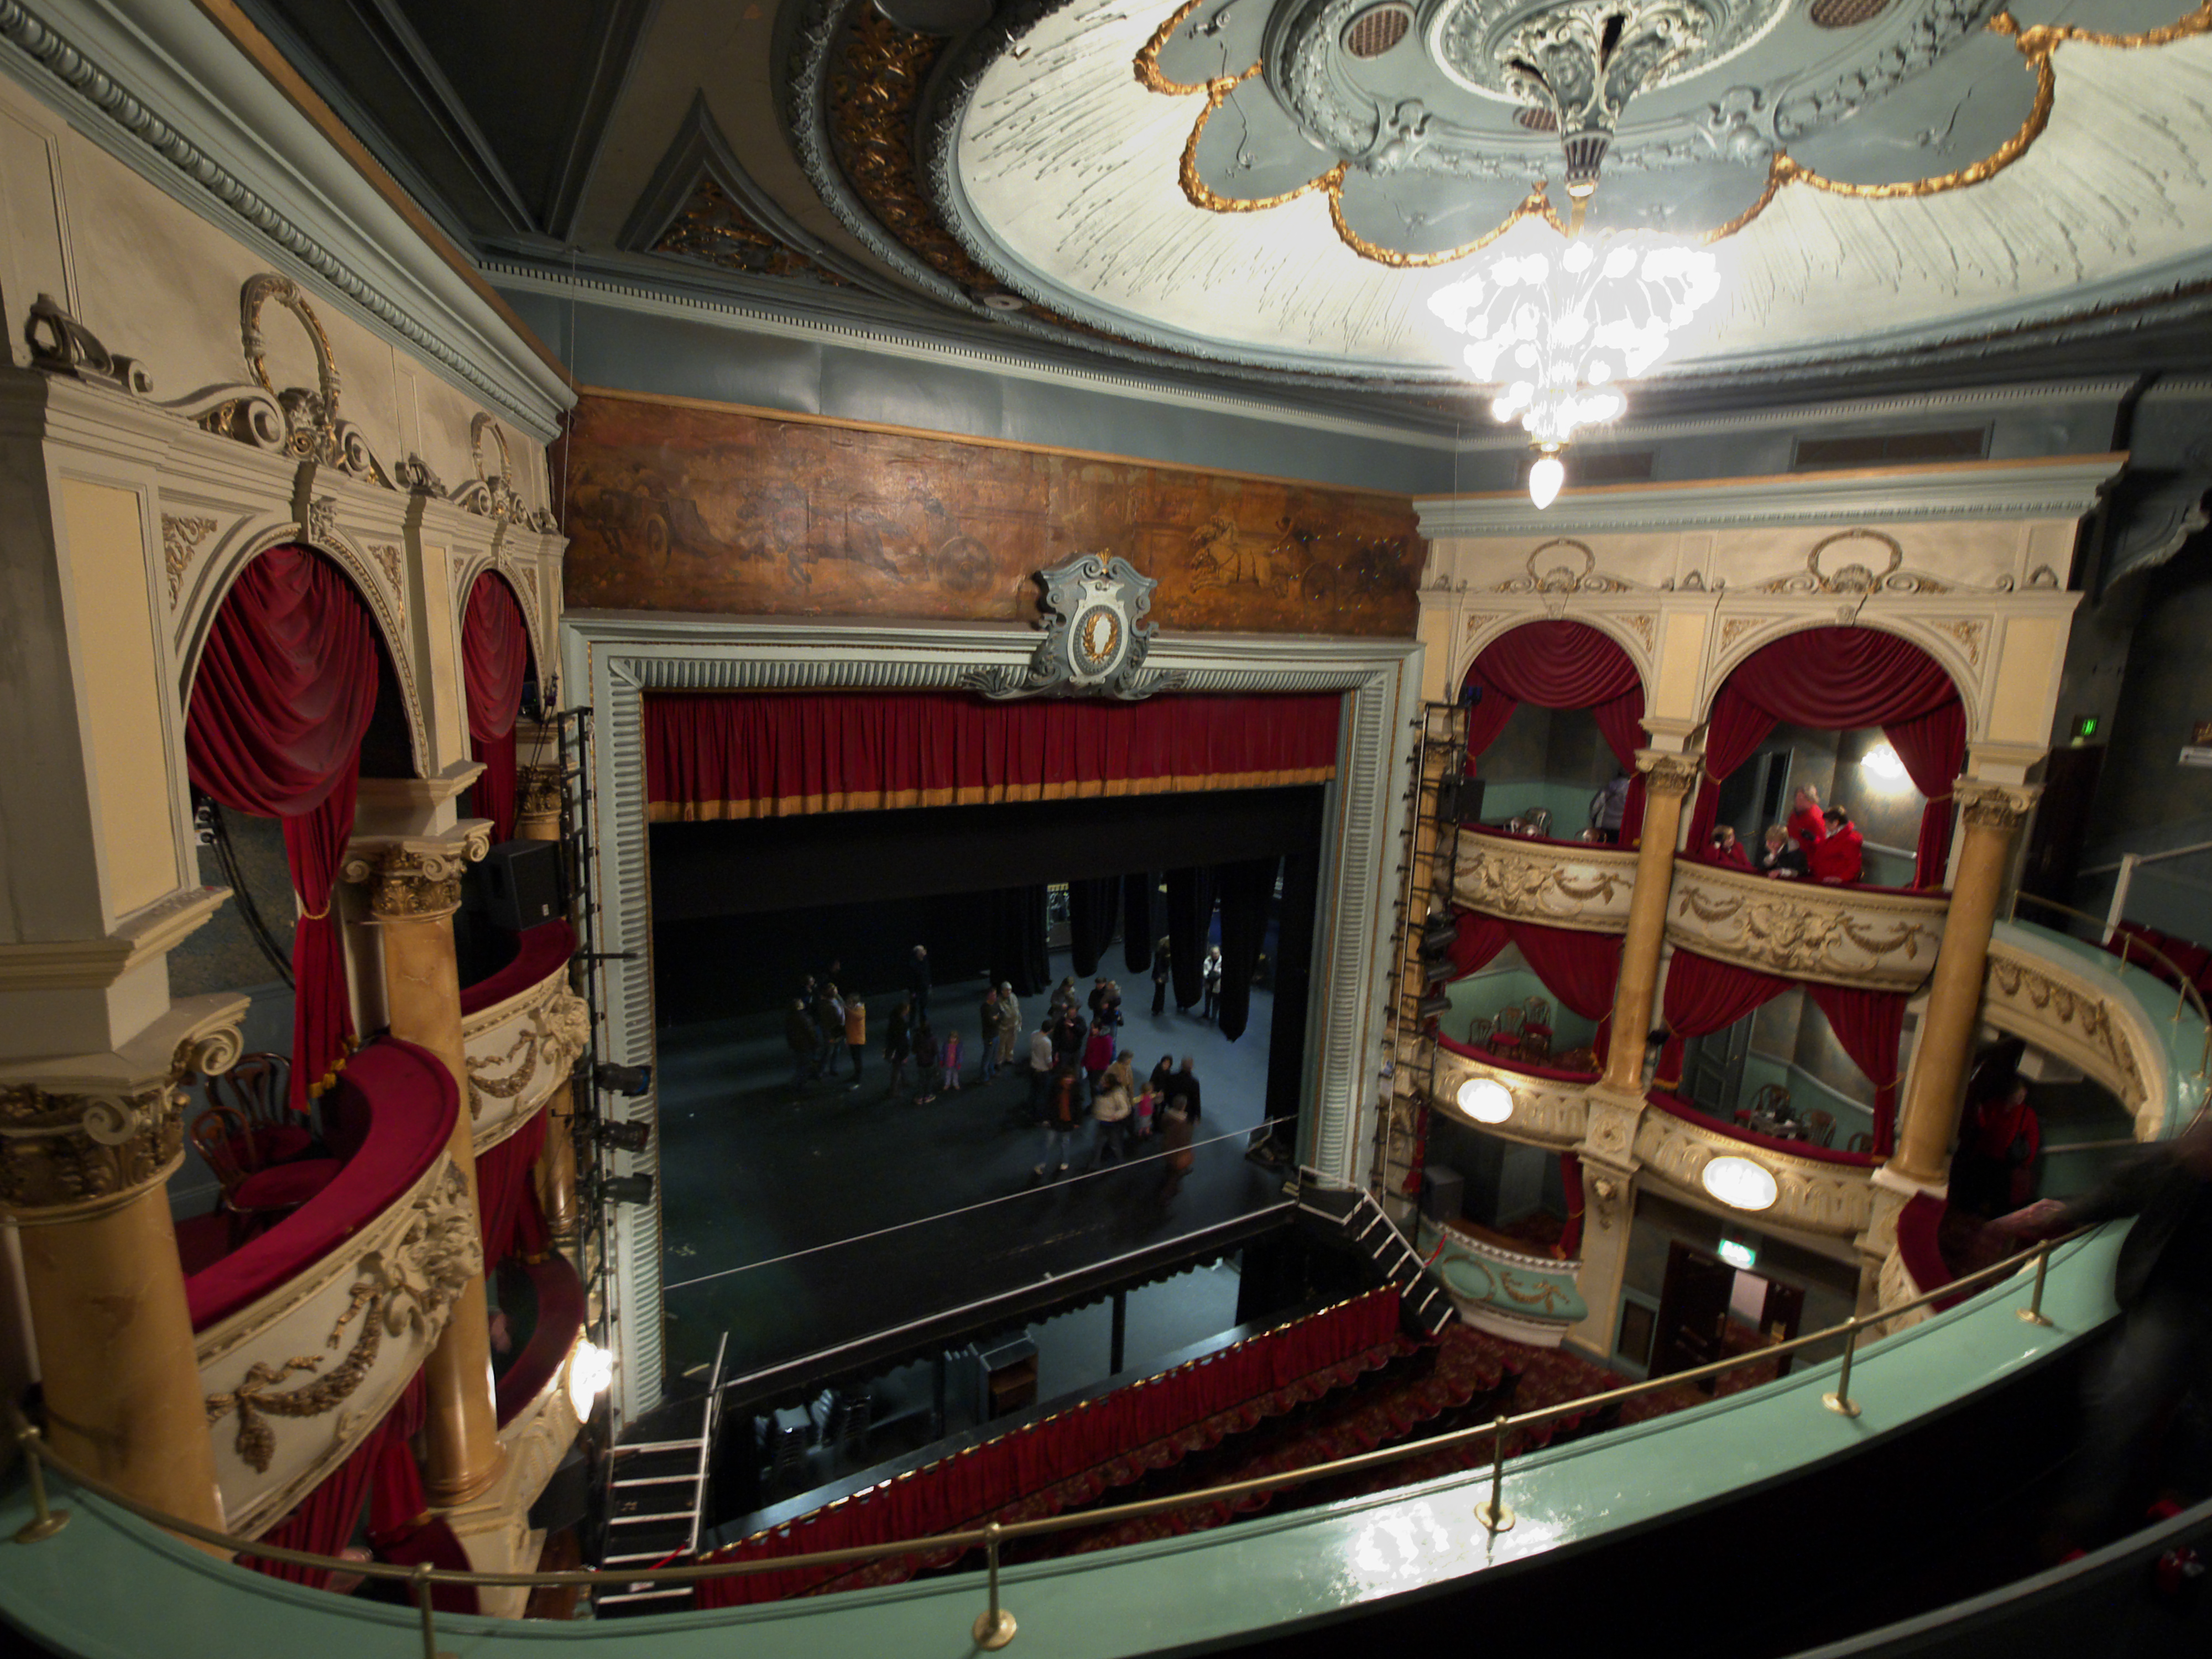 Casino opera house scarborough